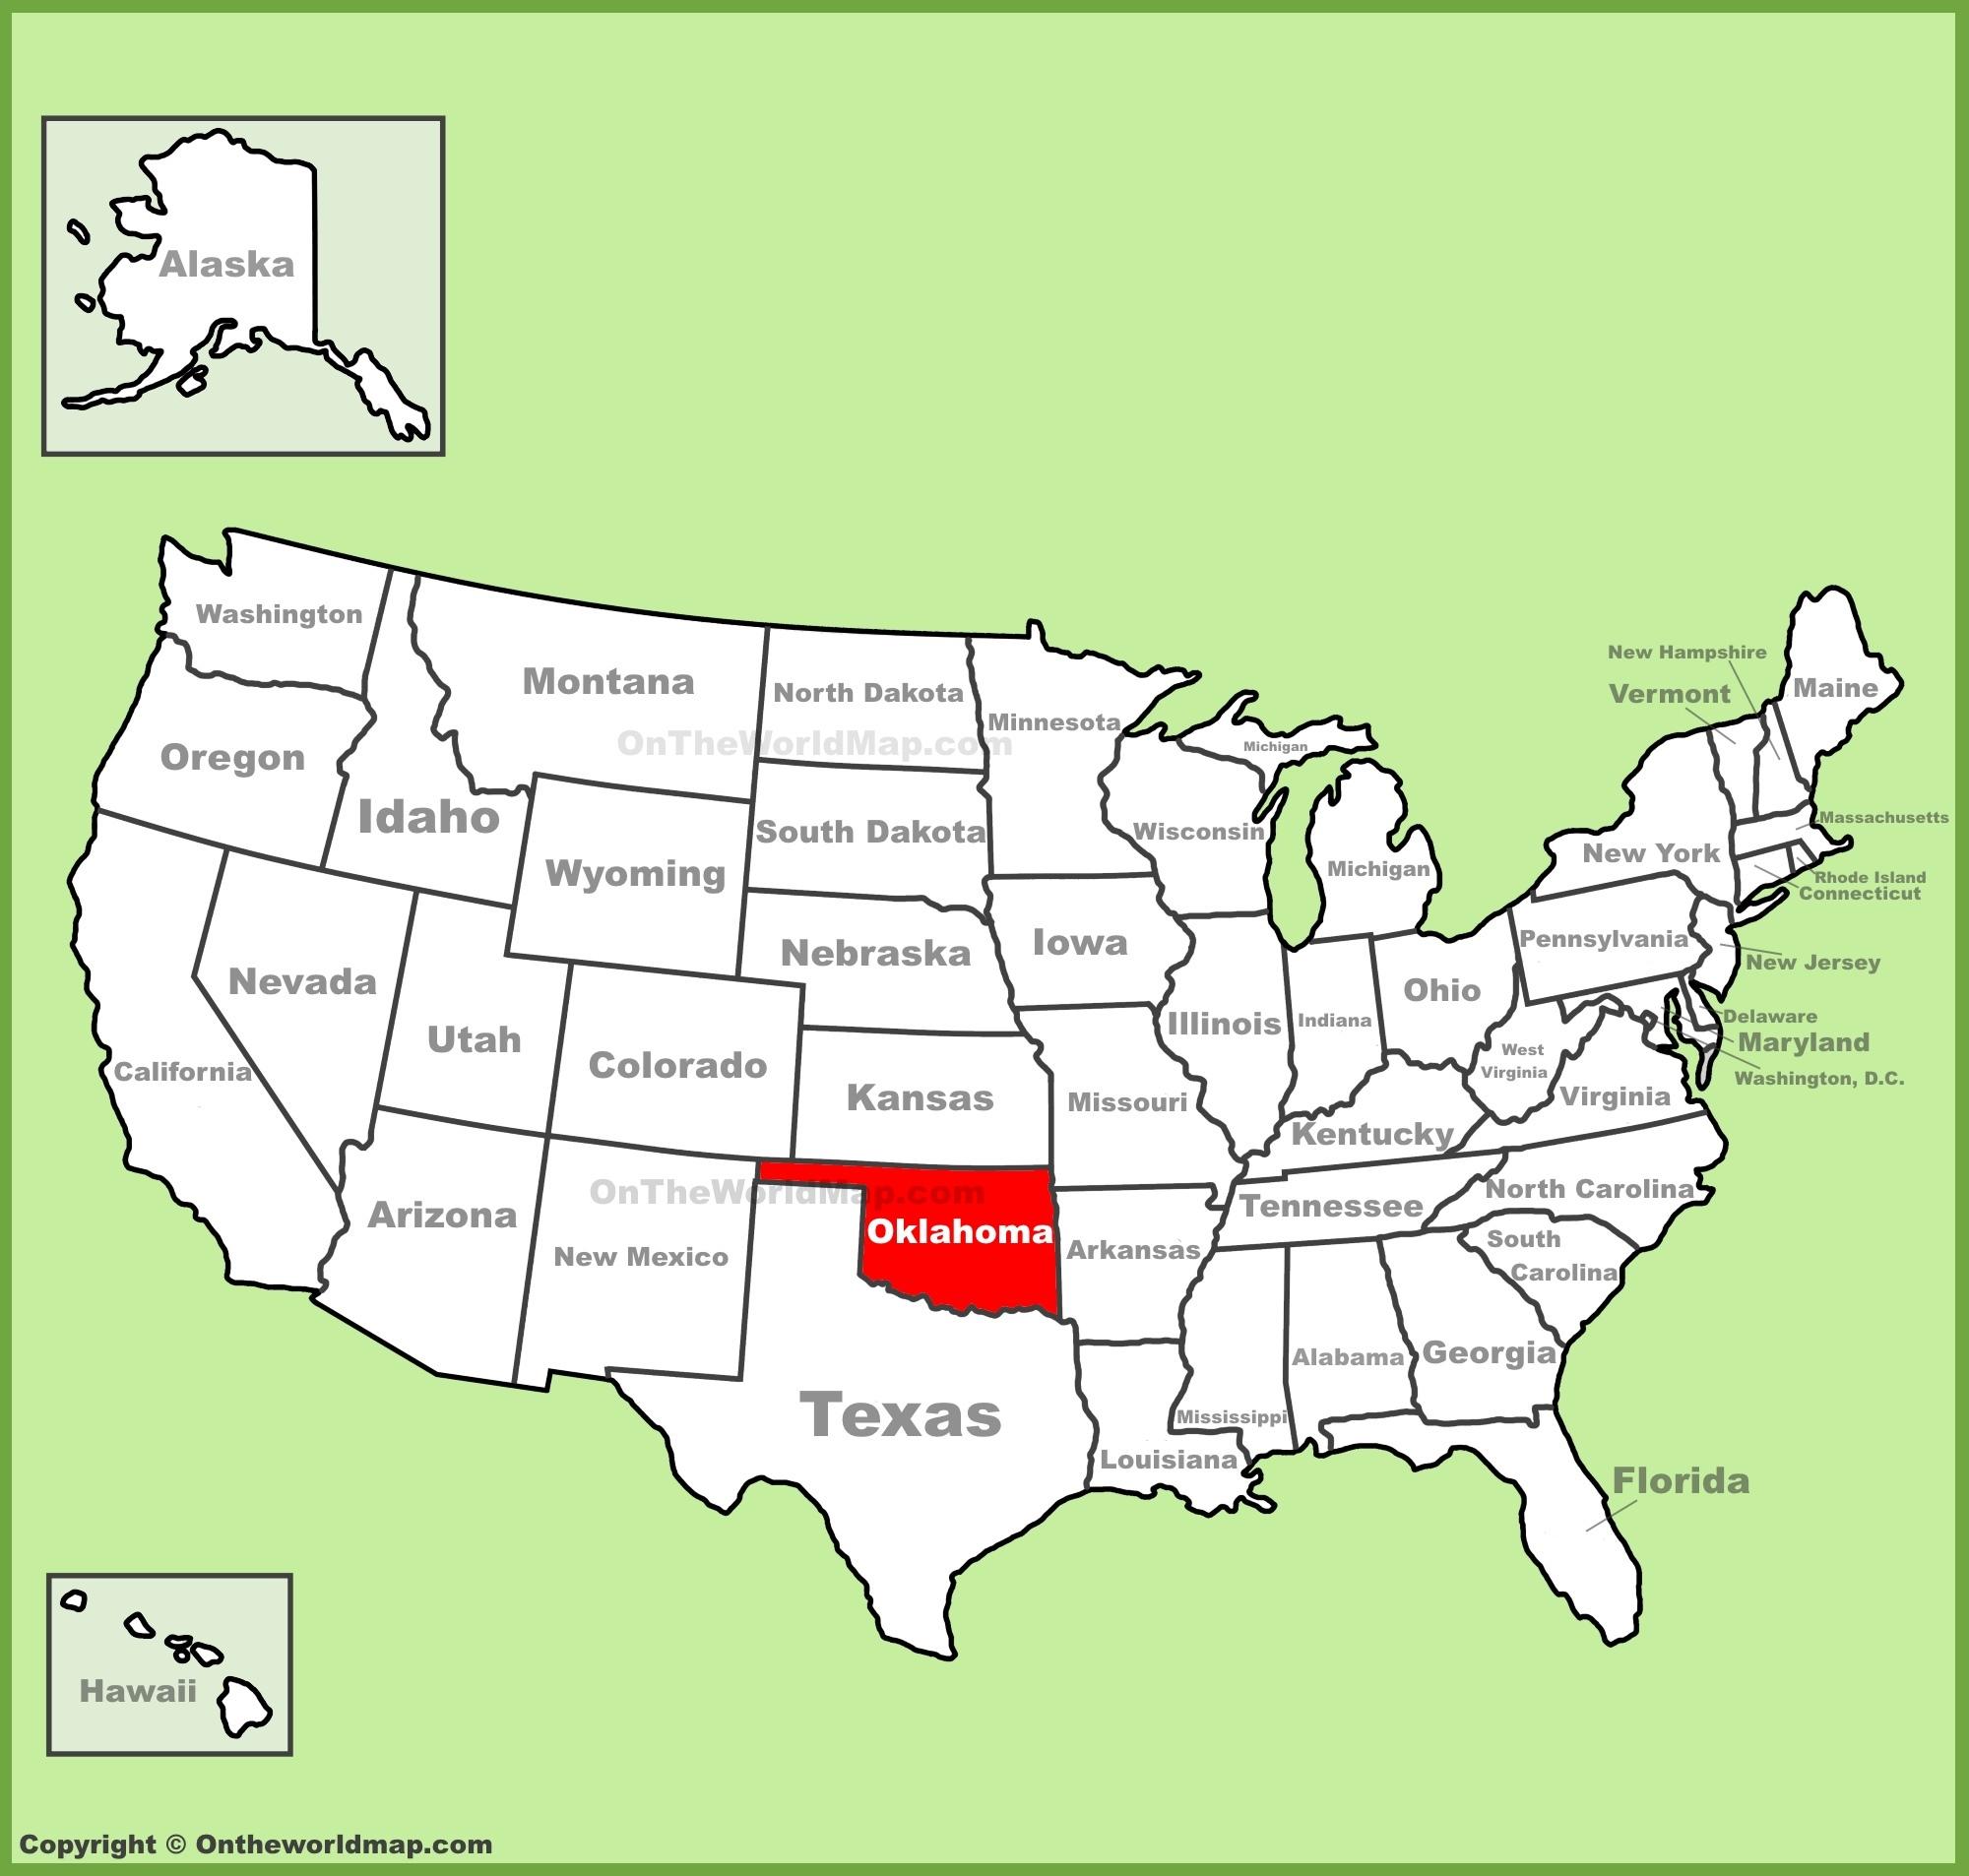 Oklahoma location on the U.S. Map